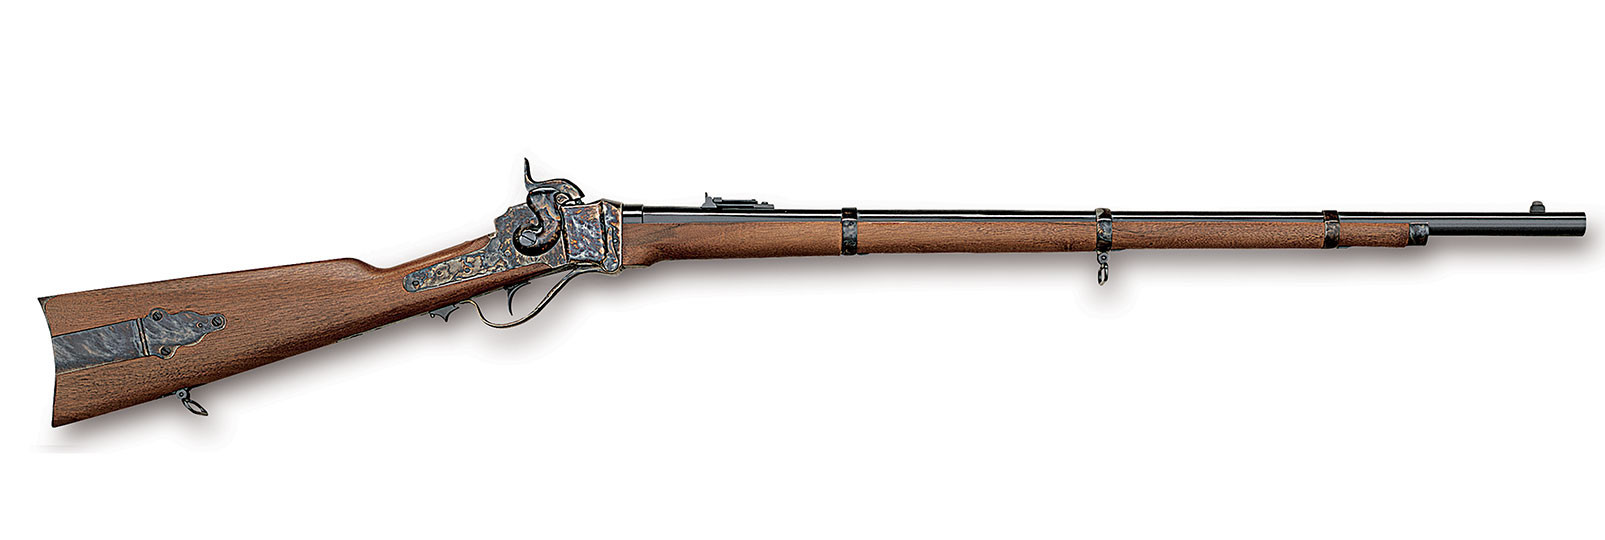 1859 & 1863 Sharps